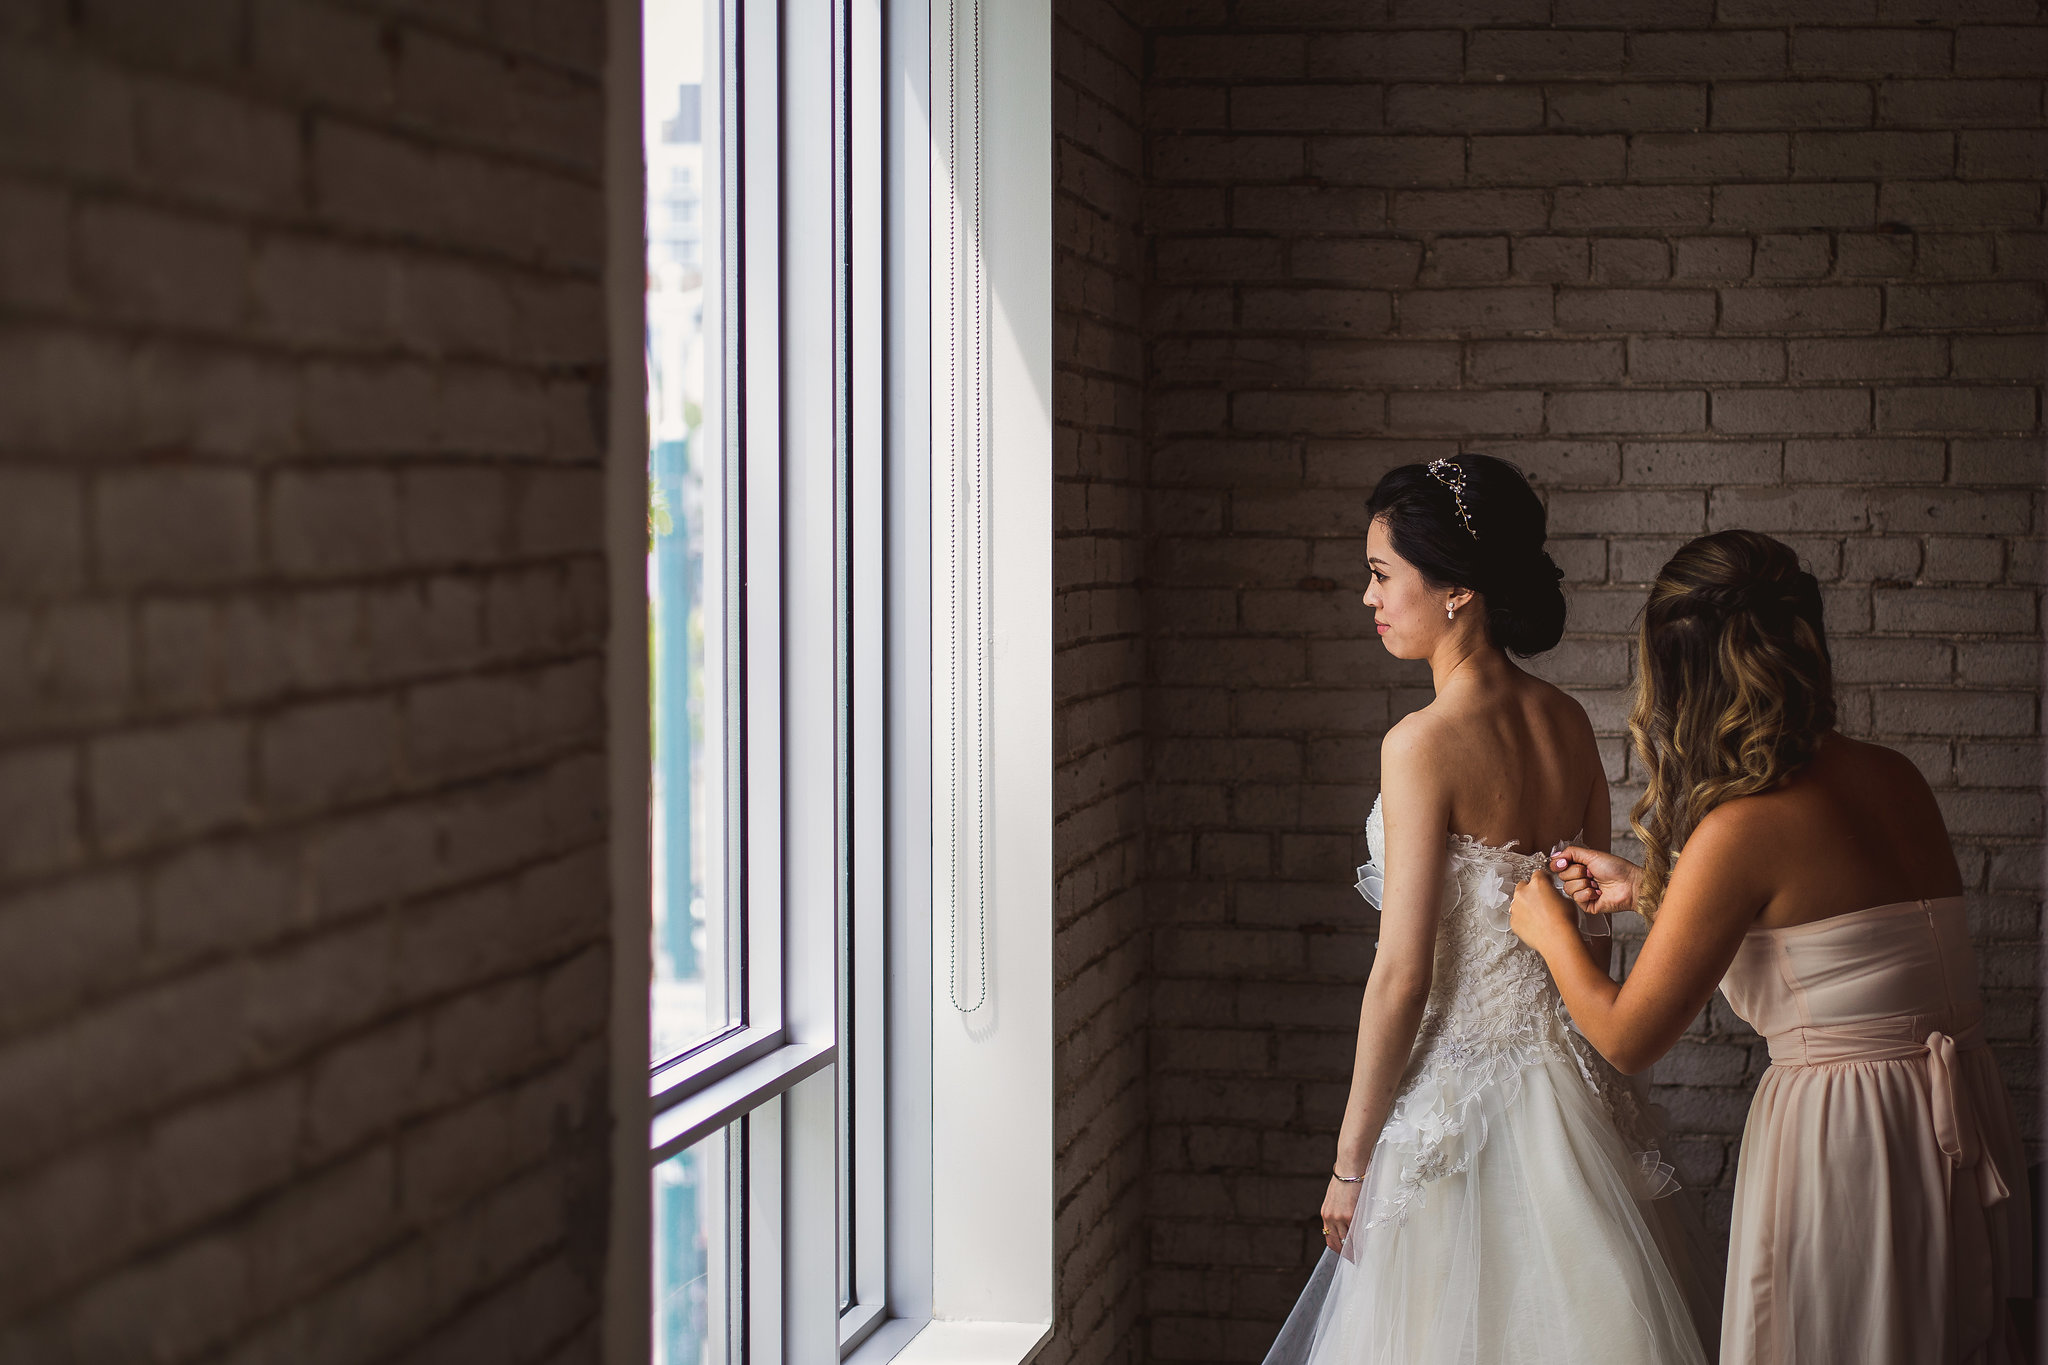 Jessica Jason Hotel Ocho Wedding Photos 125 - Hotel Ocho Wedding